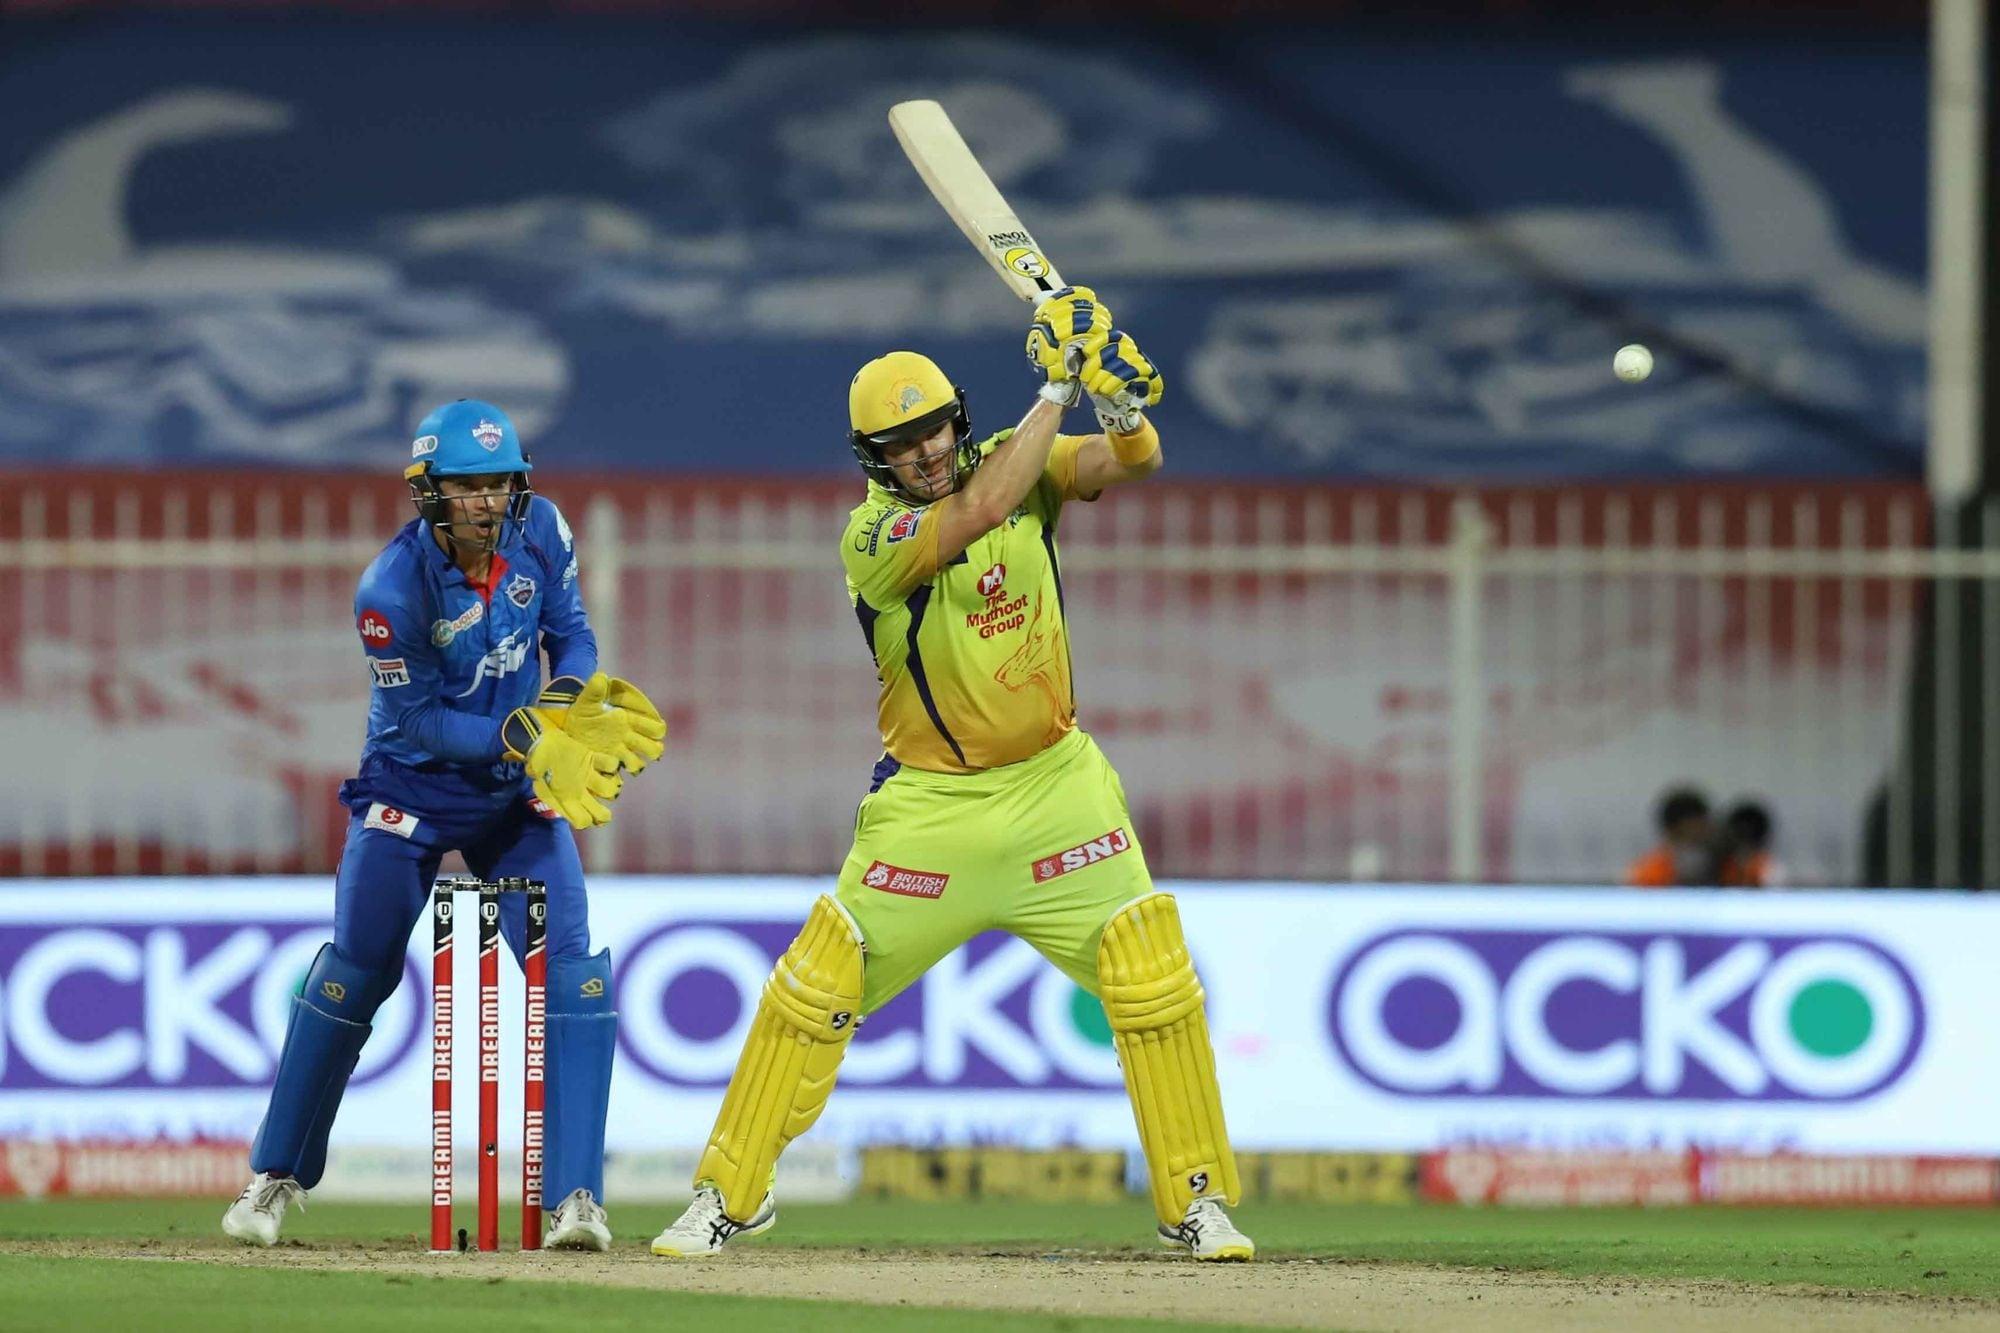 IPL 2020: In Pics, Delhi Capitals vs Chennai Super Kings, Match 34 in Sharjah